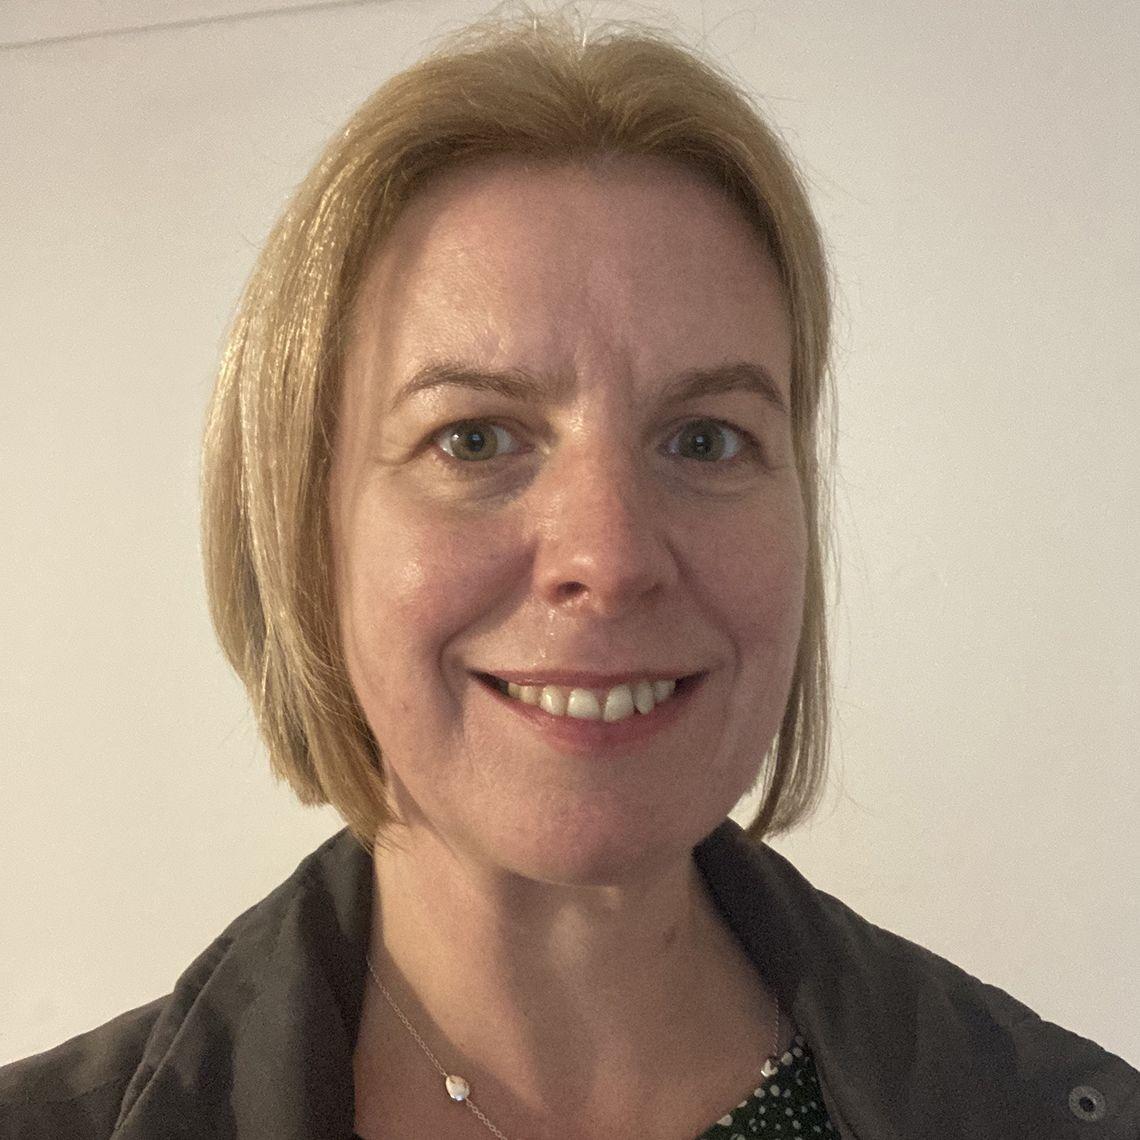 Professor Susanna J Dunachie